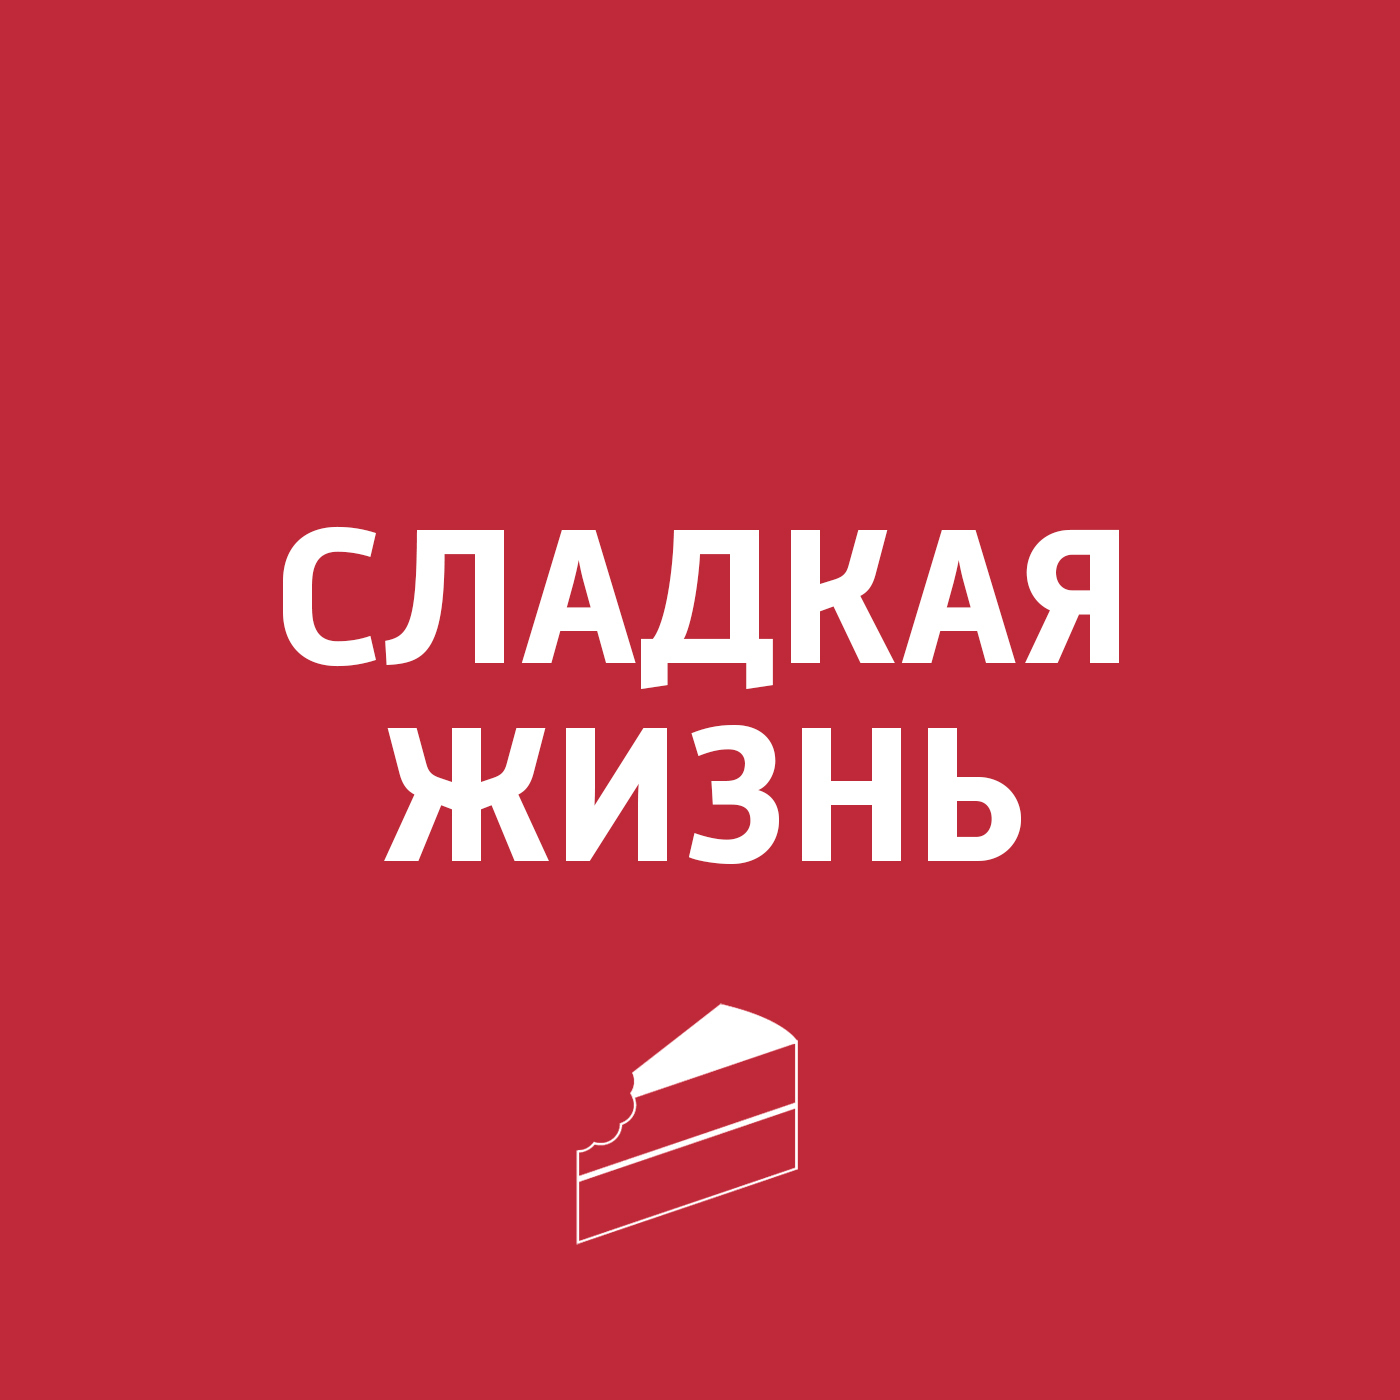 Картаев Павел Лукум картаев павел средиземное море